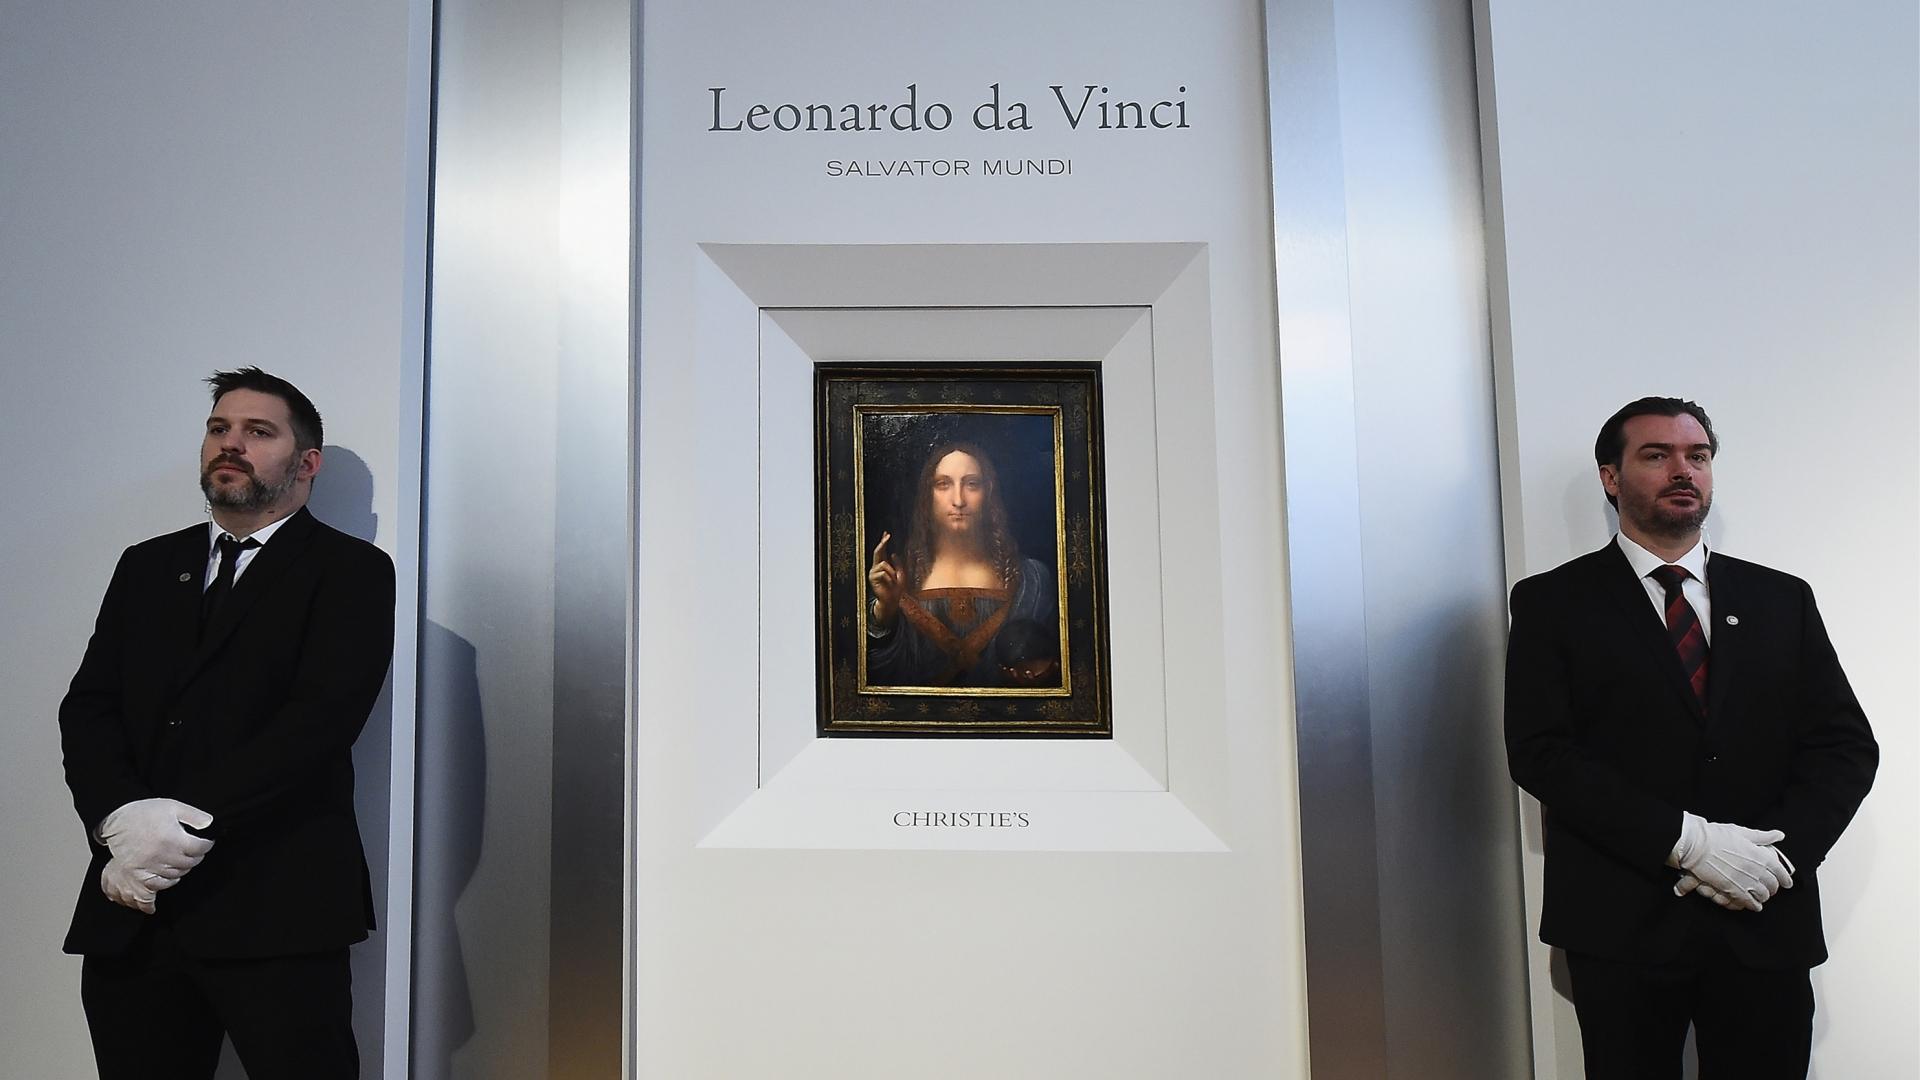 Leonardo da Vinci's 'Salvator Mundi' unveiled at Christie's New York on October 10, 2017 in New York City. (Credit: Ilya S. Savenok/Getty Images for Christie's Auction House)